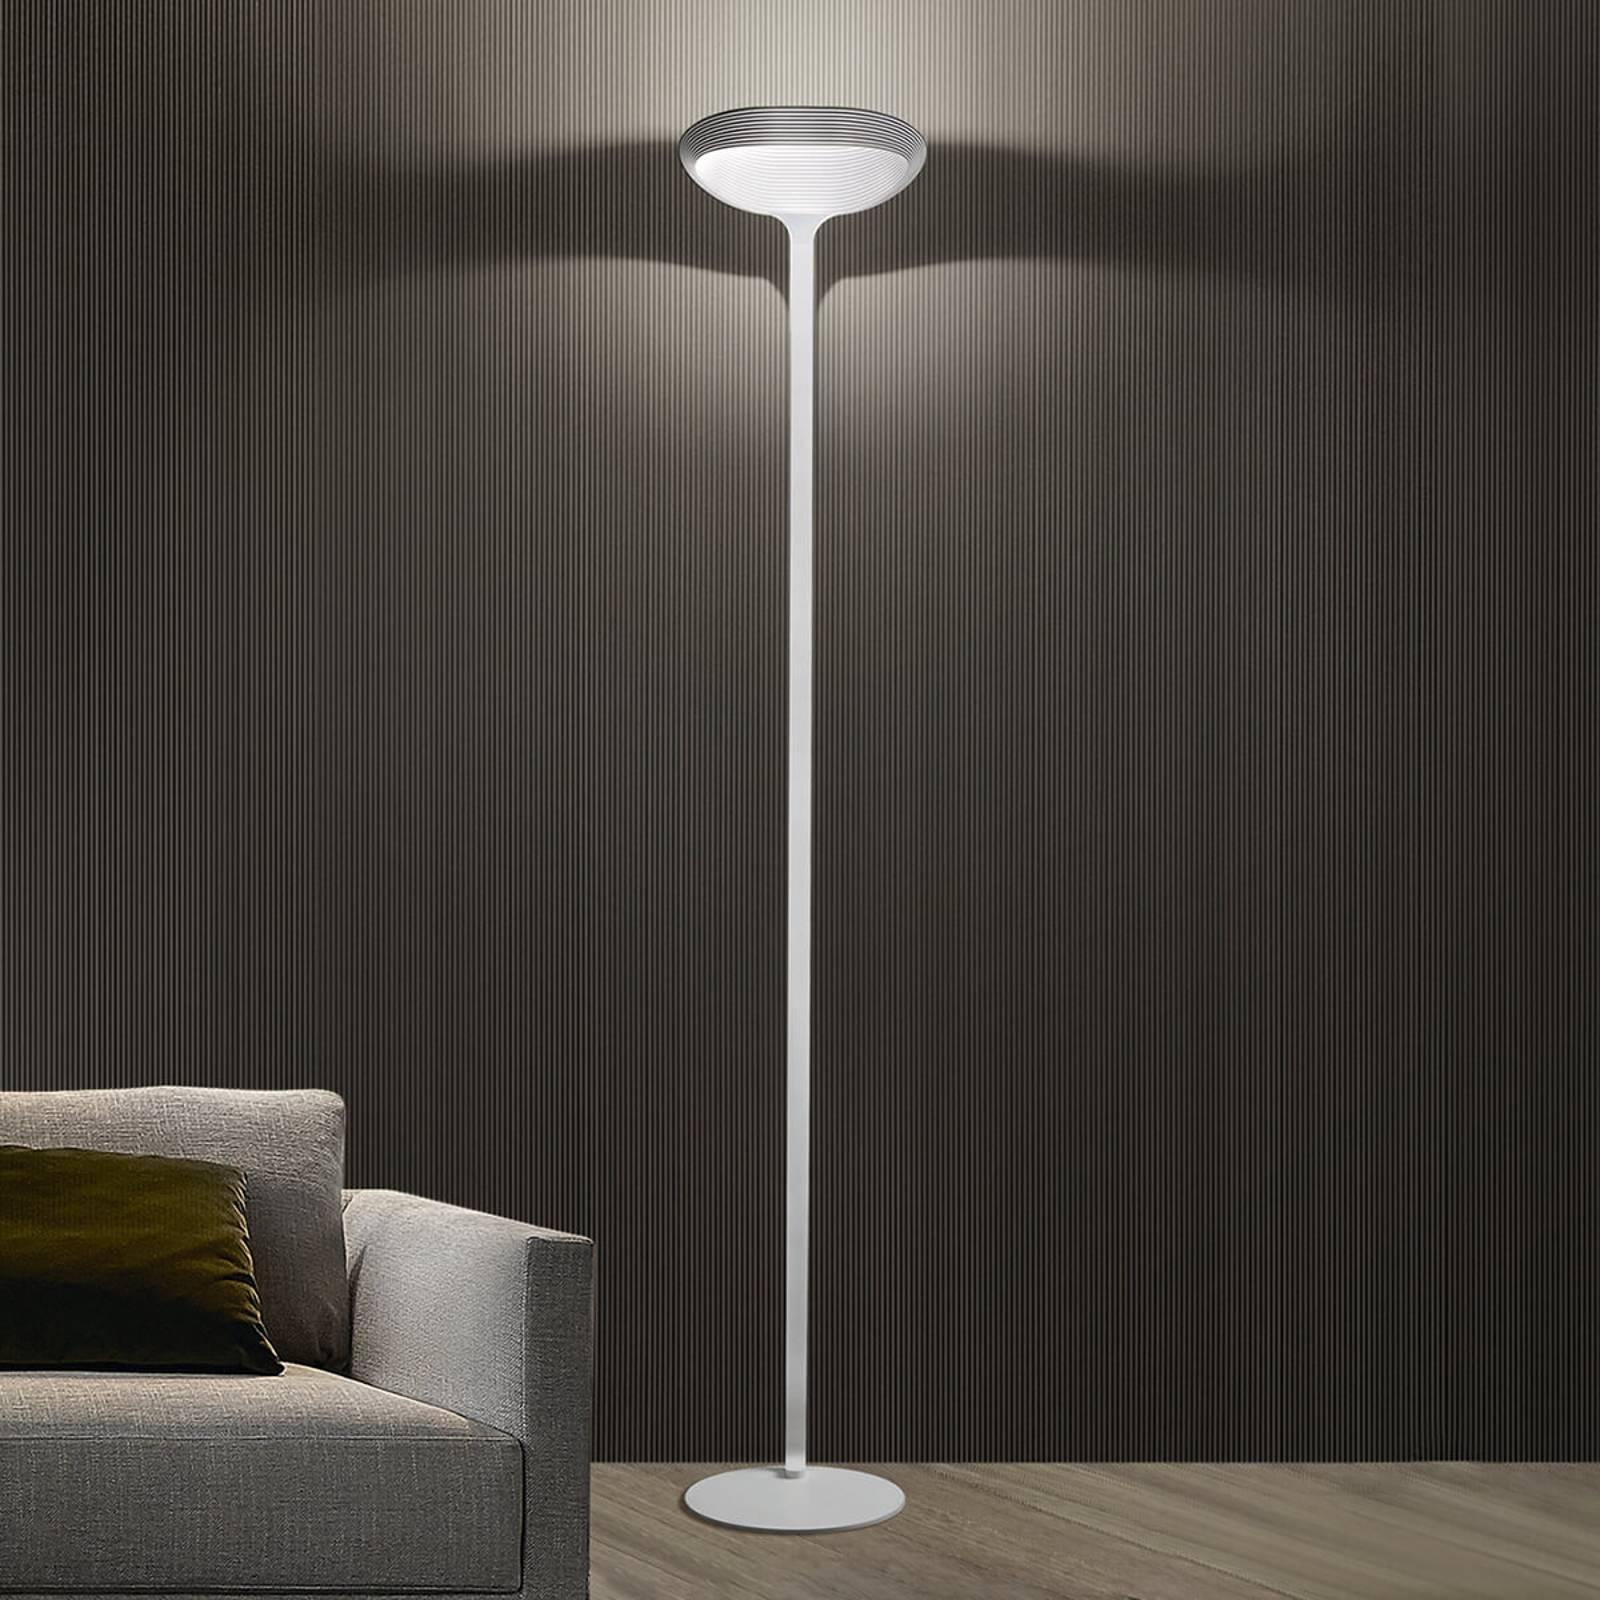 Cini&Nils Sestessa Terra LED-Stehleuchte m. Dimmer